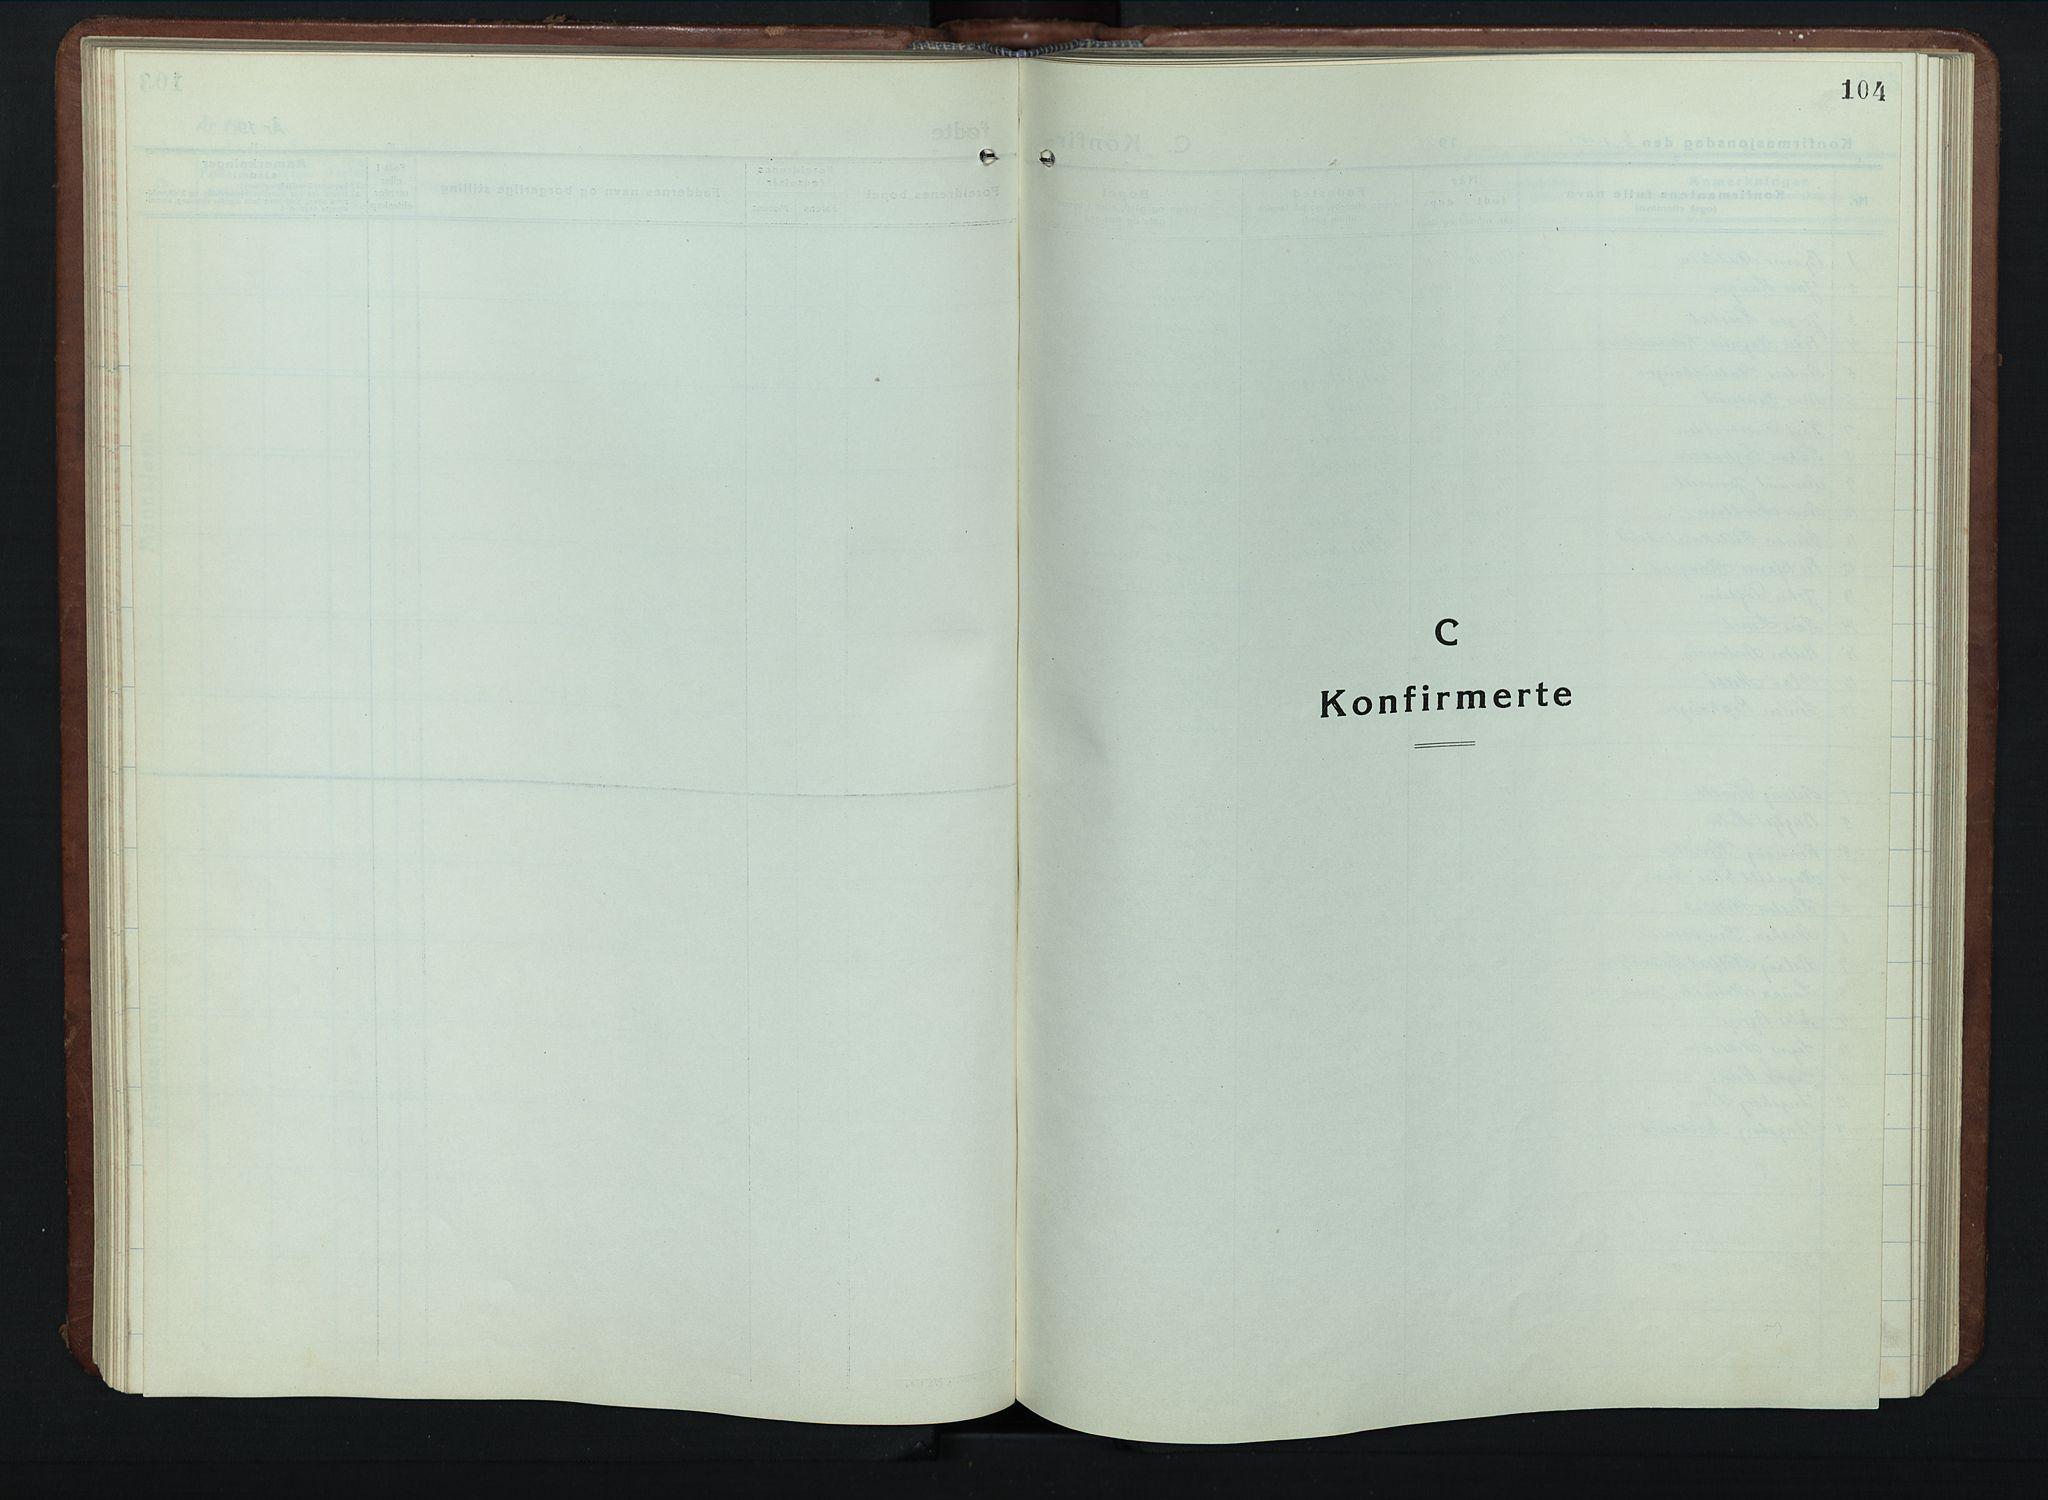 SAH, Vestre Gausdal prestekontor, Klokkerbok nr. 5, 1926-1955, s. 104